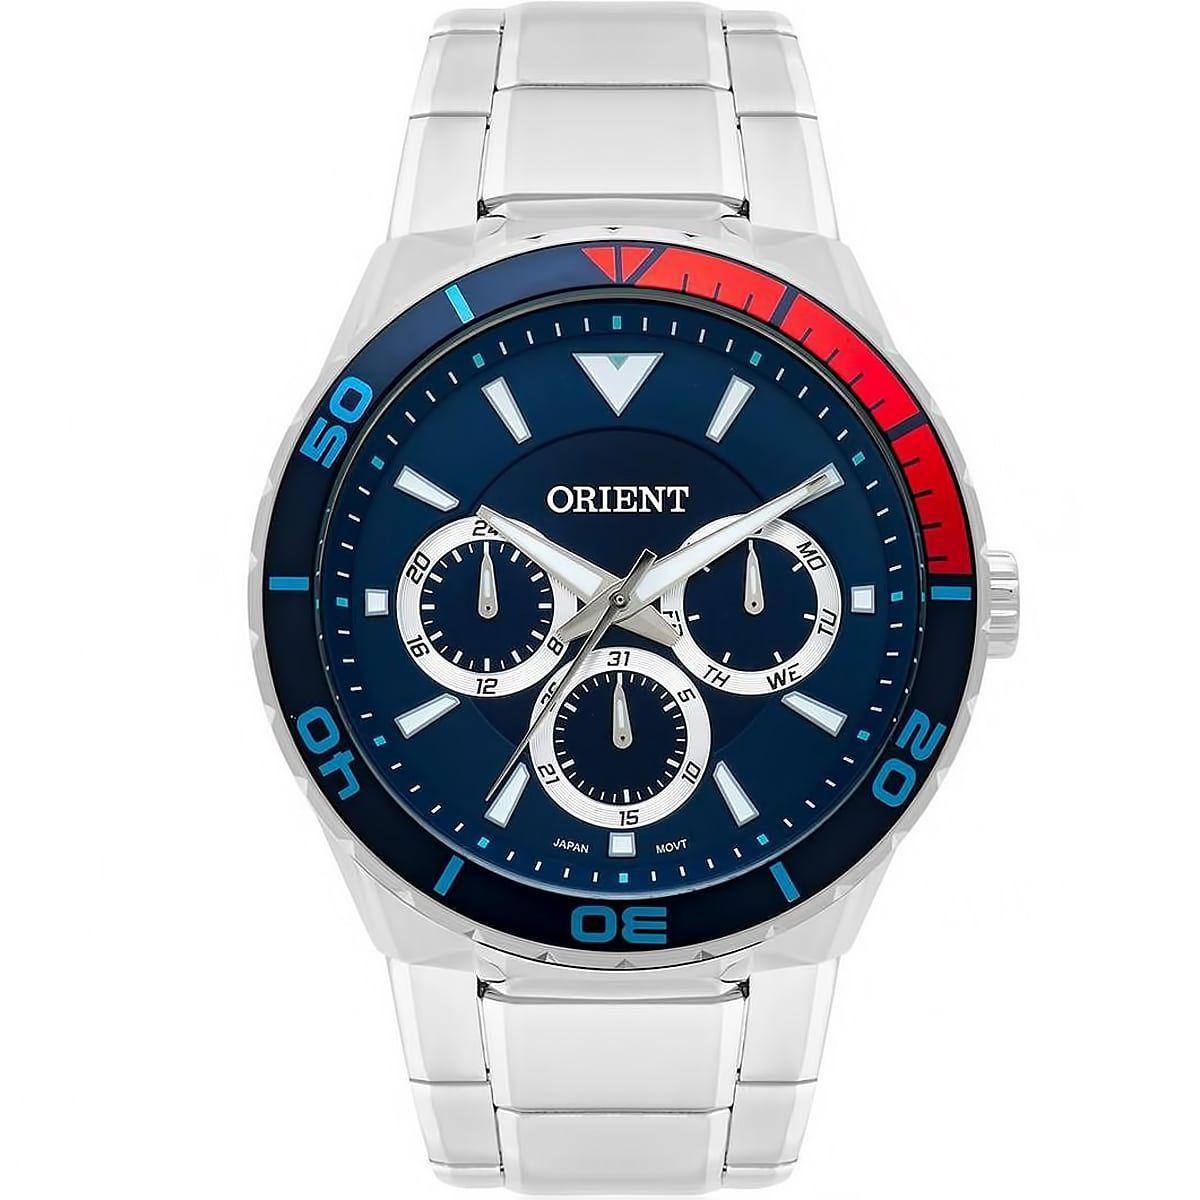 Relógio Masculino Orient MBSSM082 D1SX